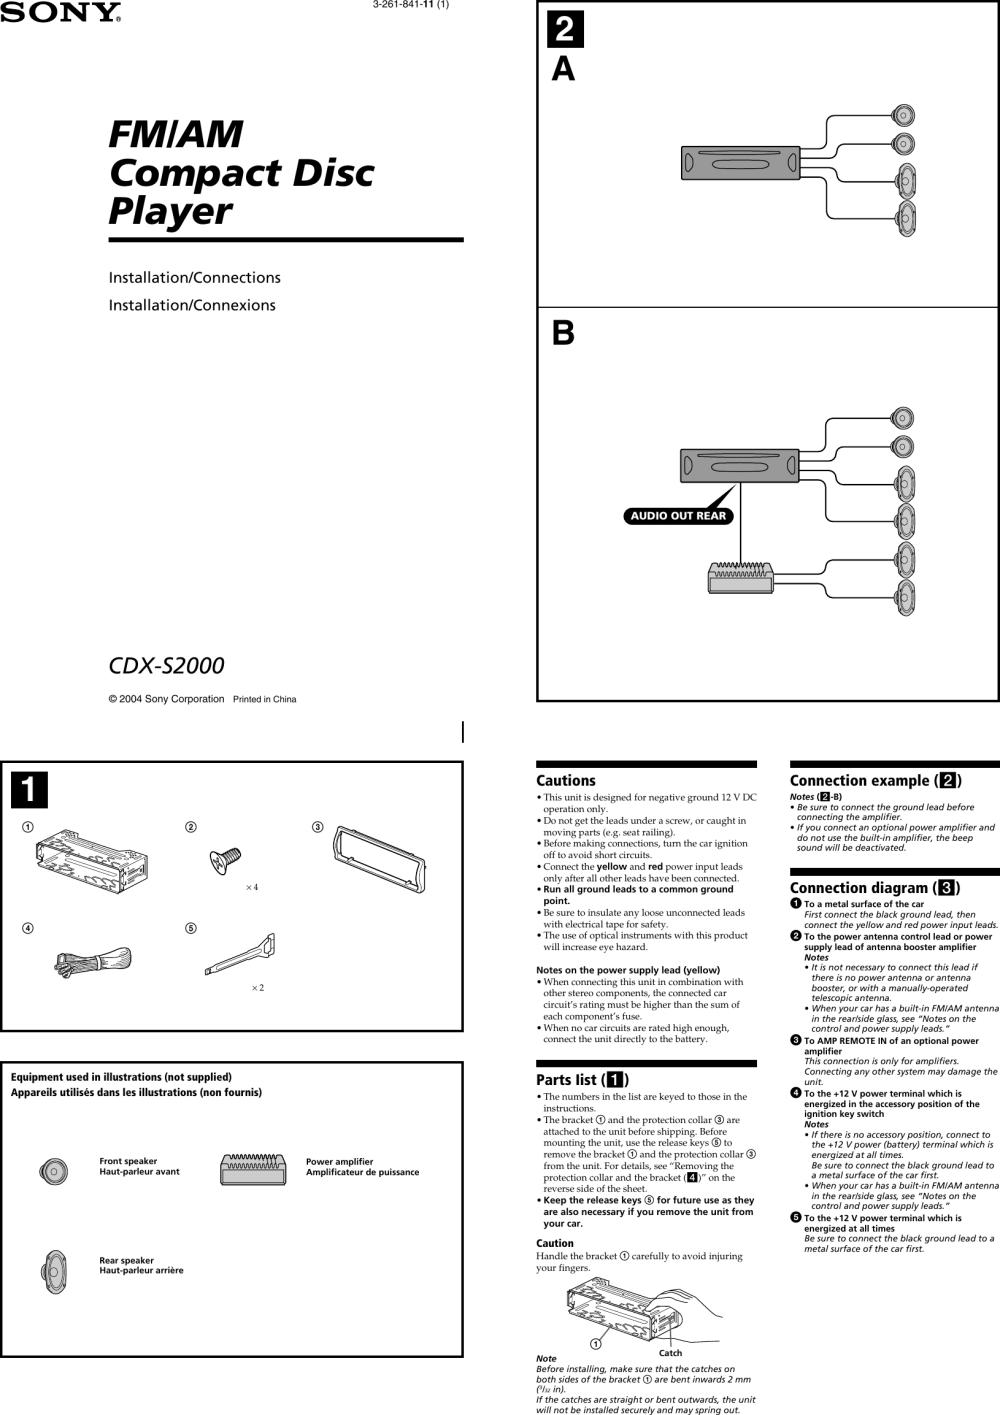 medium resolution of sony cdx s2000 users manual sony explode head unit diagram sony cdx s2000 wiring diagram